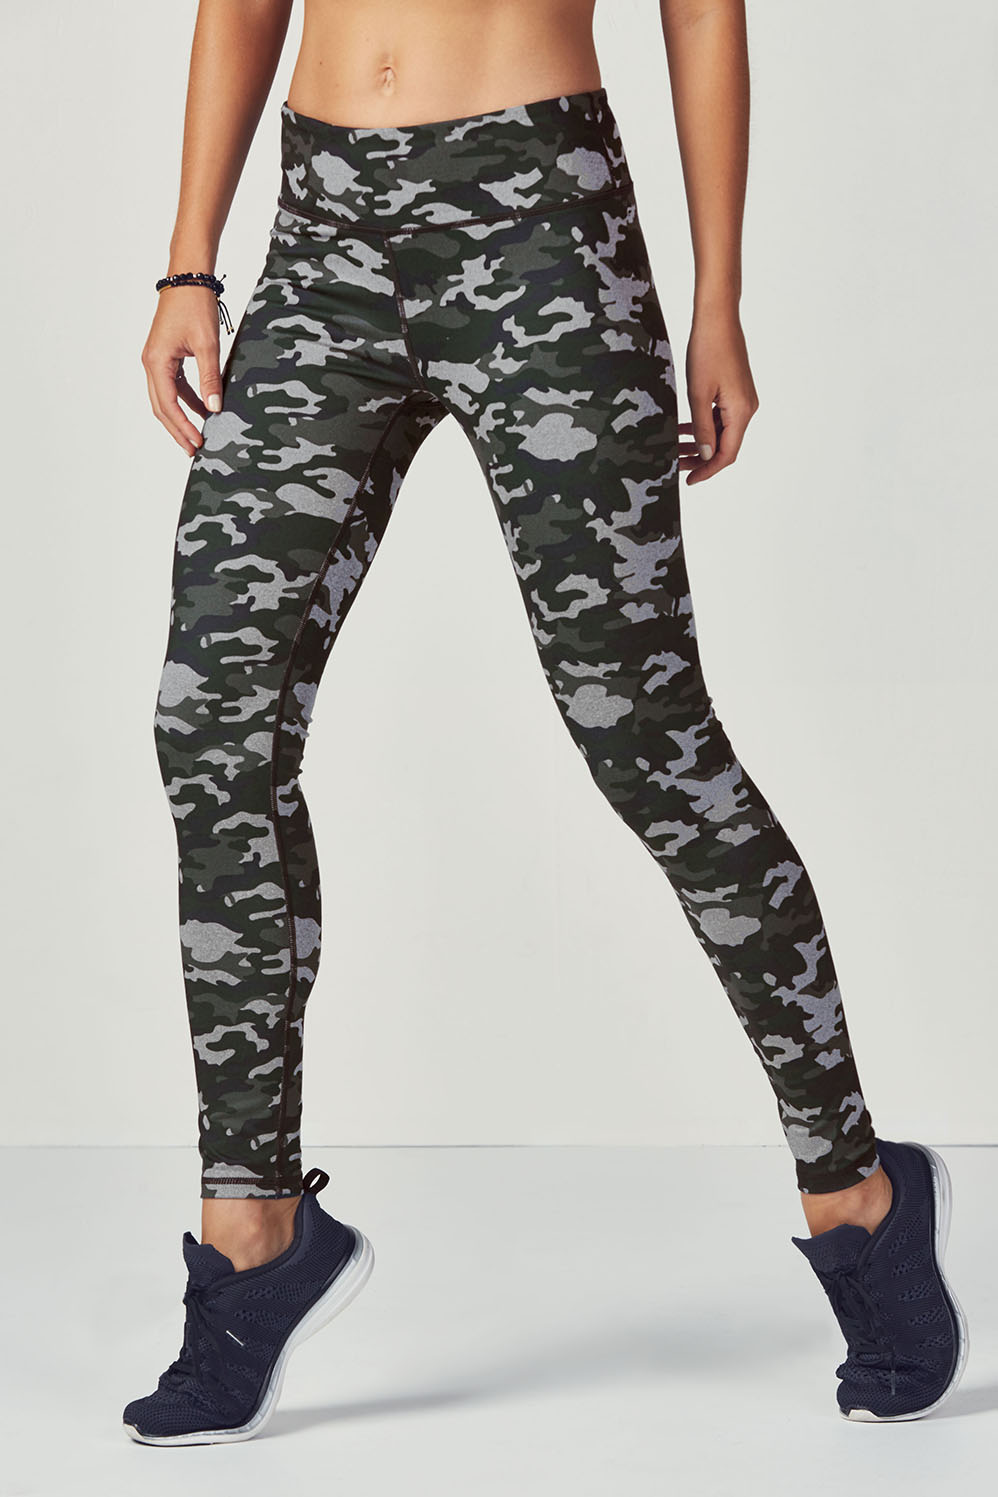 1a8948483 Salar Printed PowerHold® Legging - Moss Camo Print